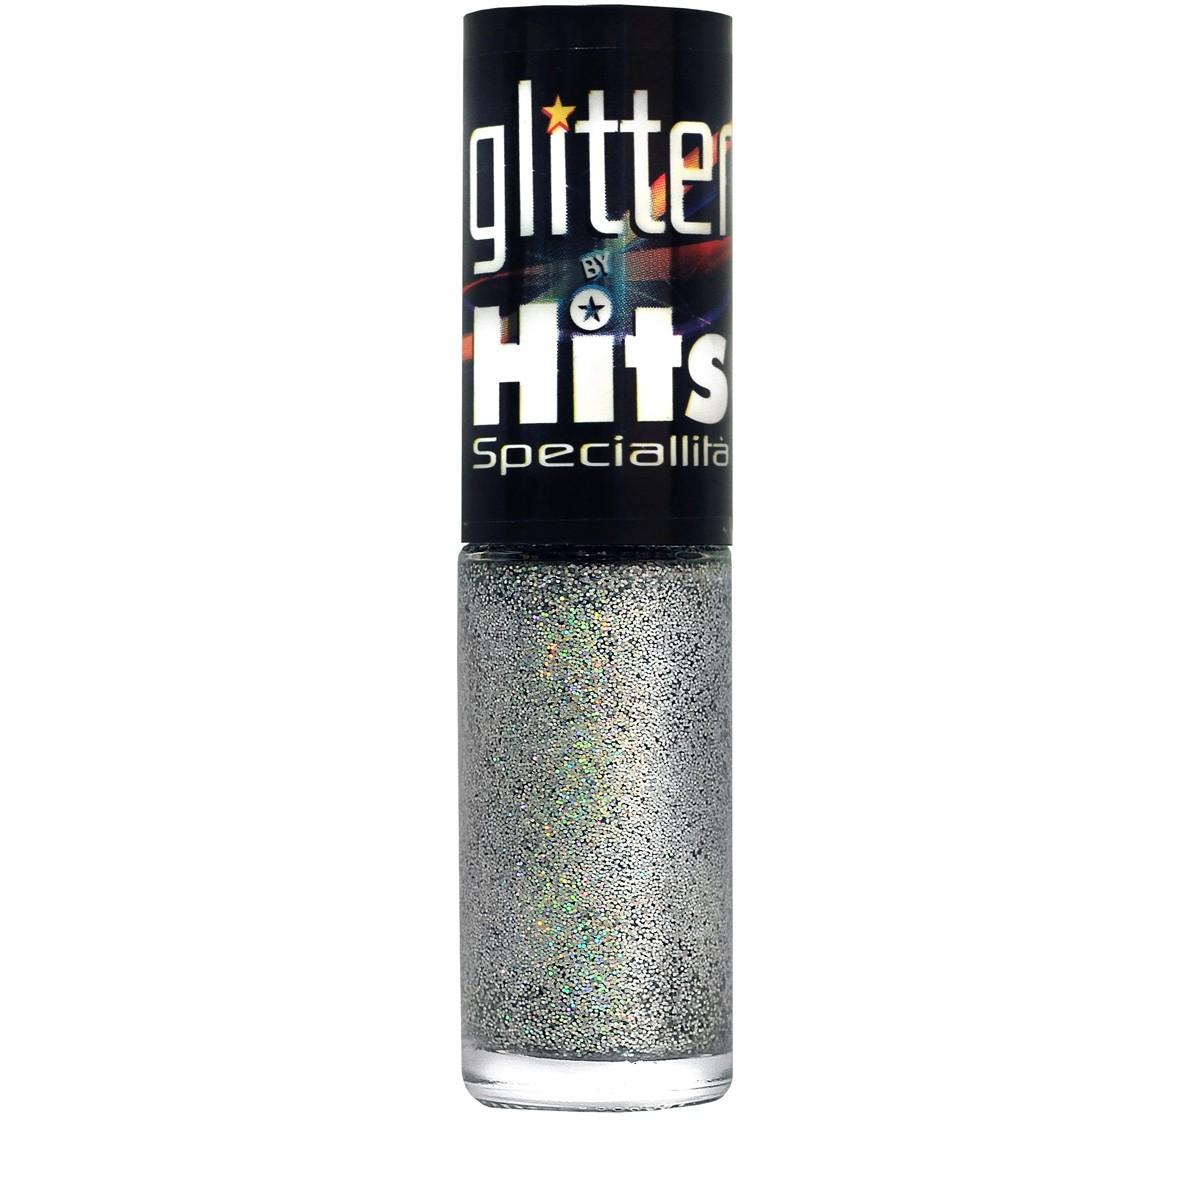 Esmalte Hits Glitter Forte 388 Hard Rock 4free 6ml